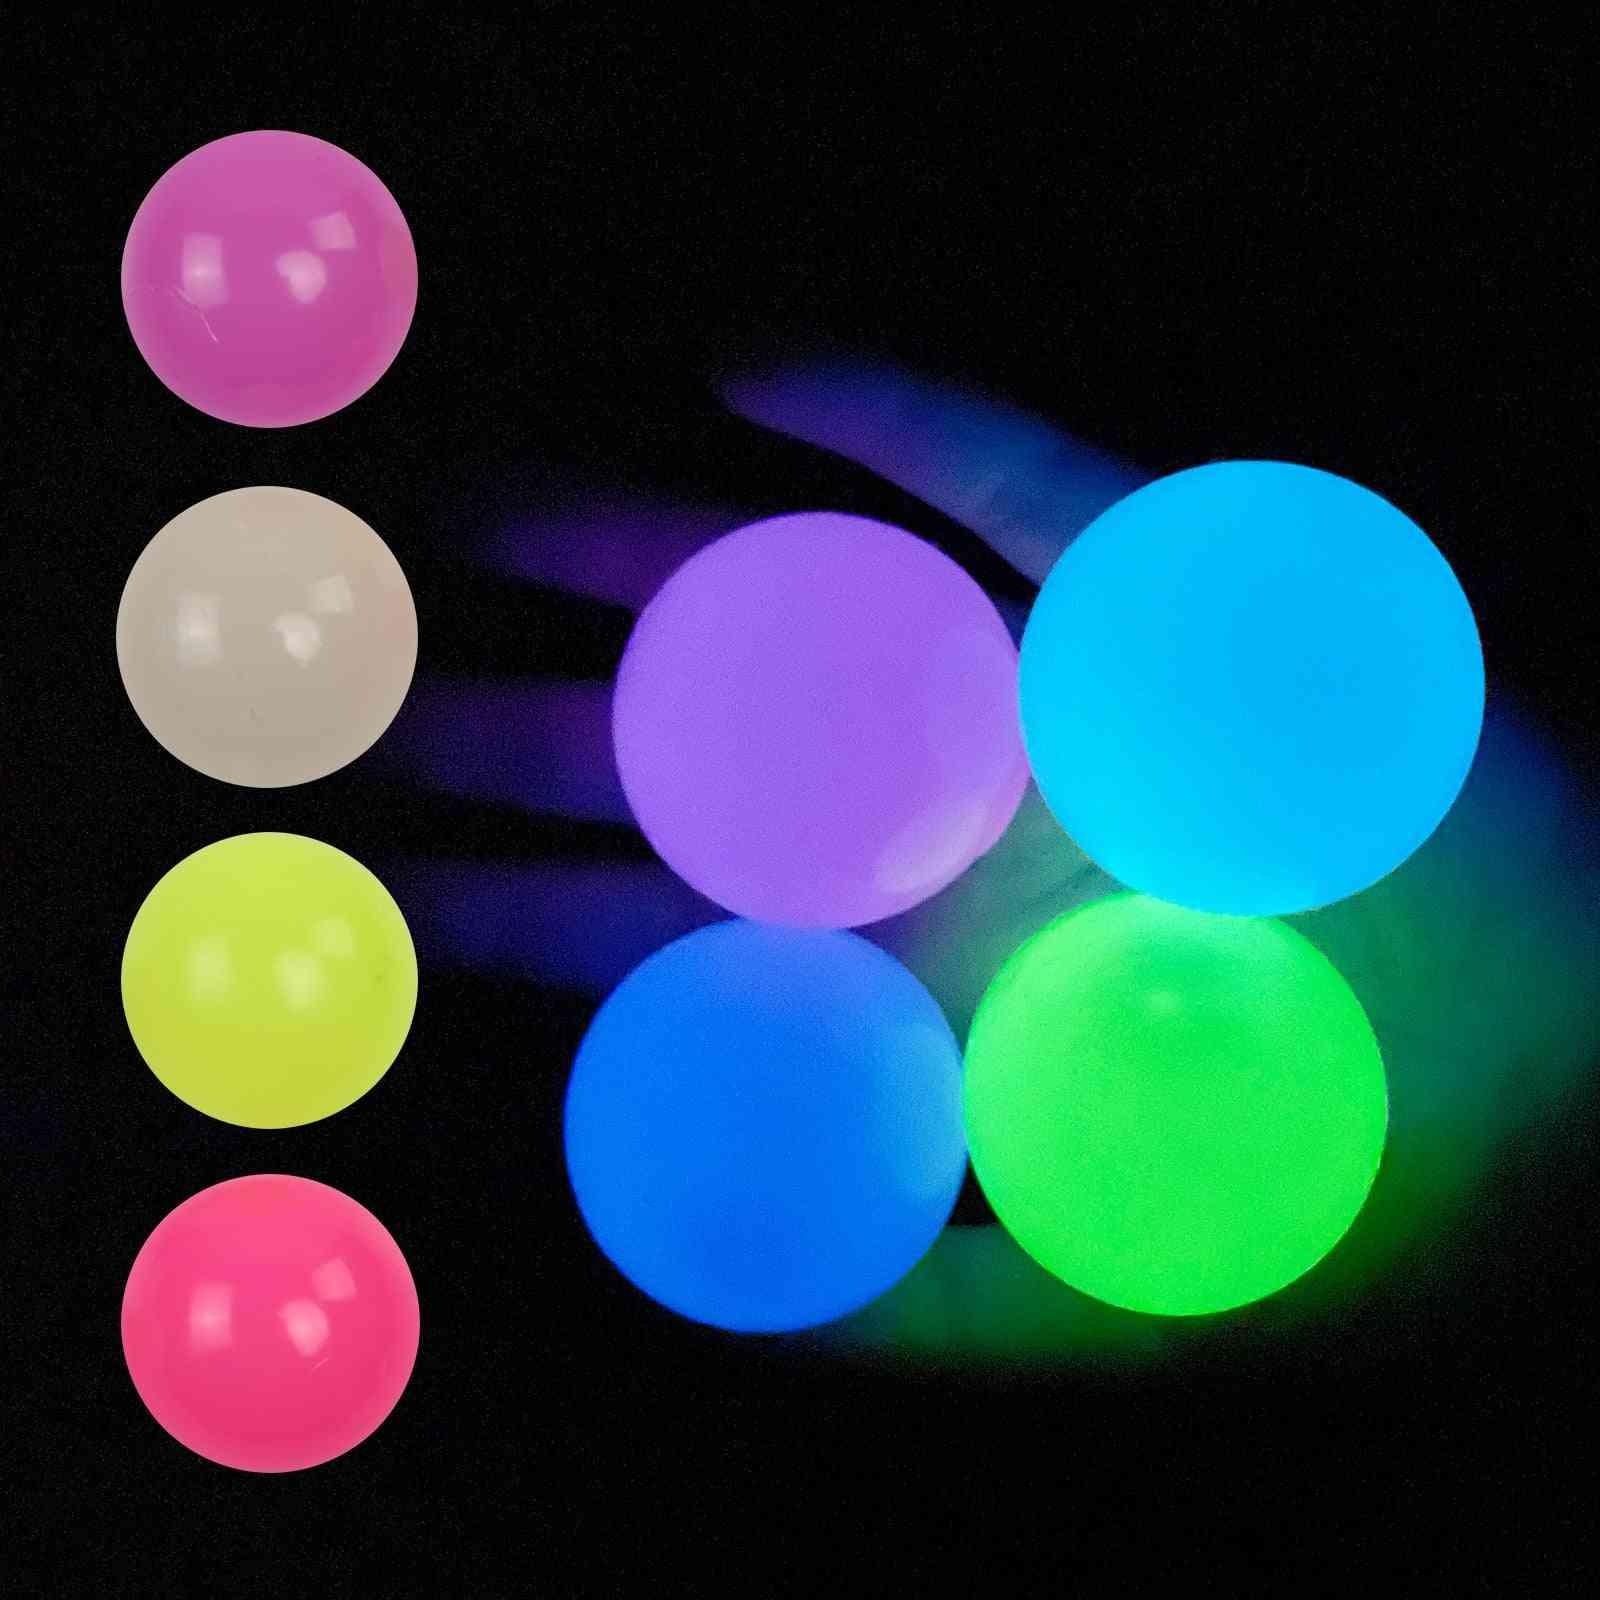 Luminous Wall Target Ball Sucker